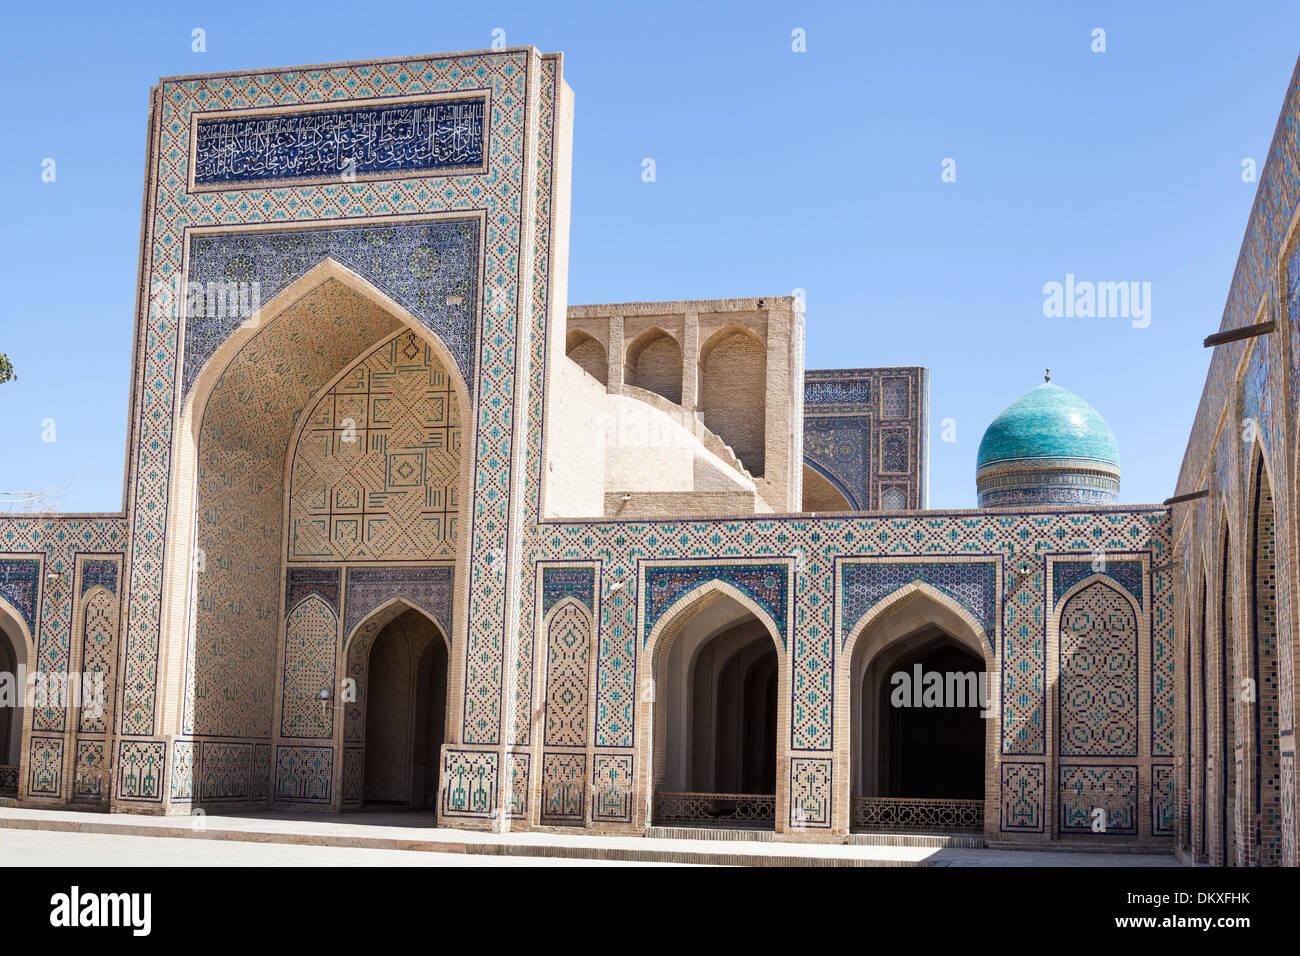 Architettura islamica in cortile, la Moschea Kalon, (Kalyan Moschea), dome di Mir mi Madrasah araba, Bukhara, Uzbekistan Immagini Stock